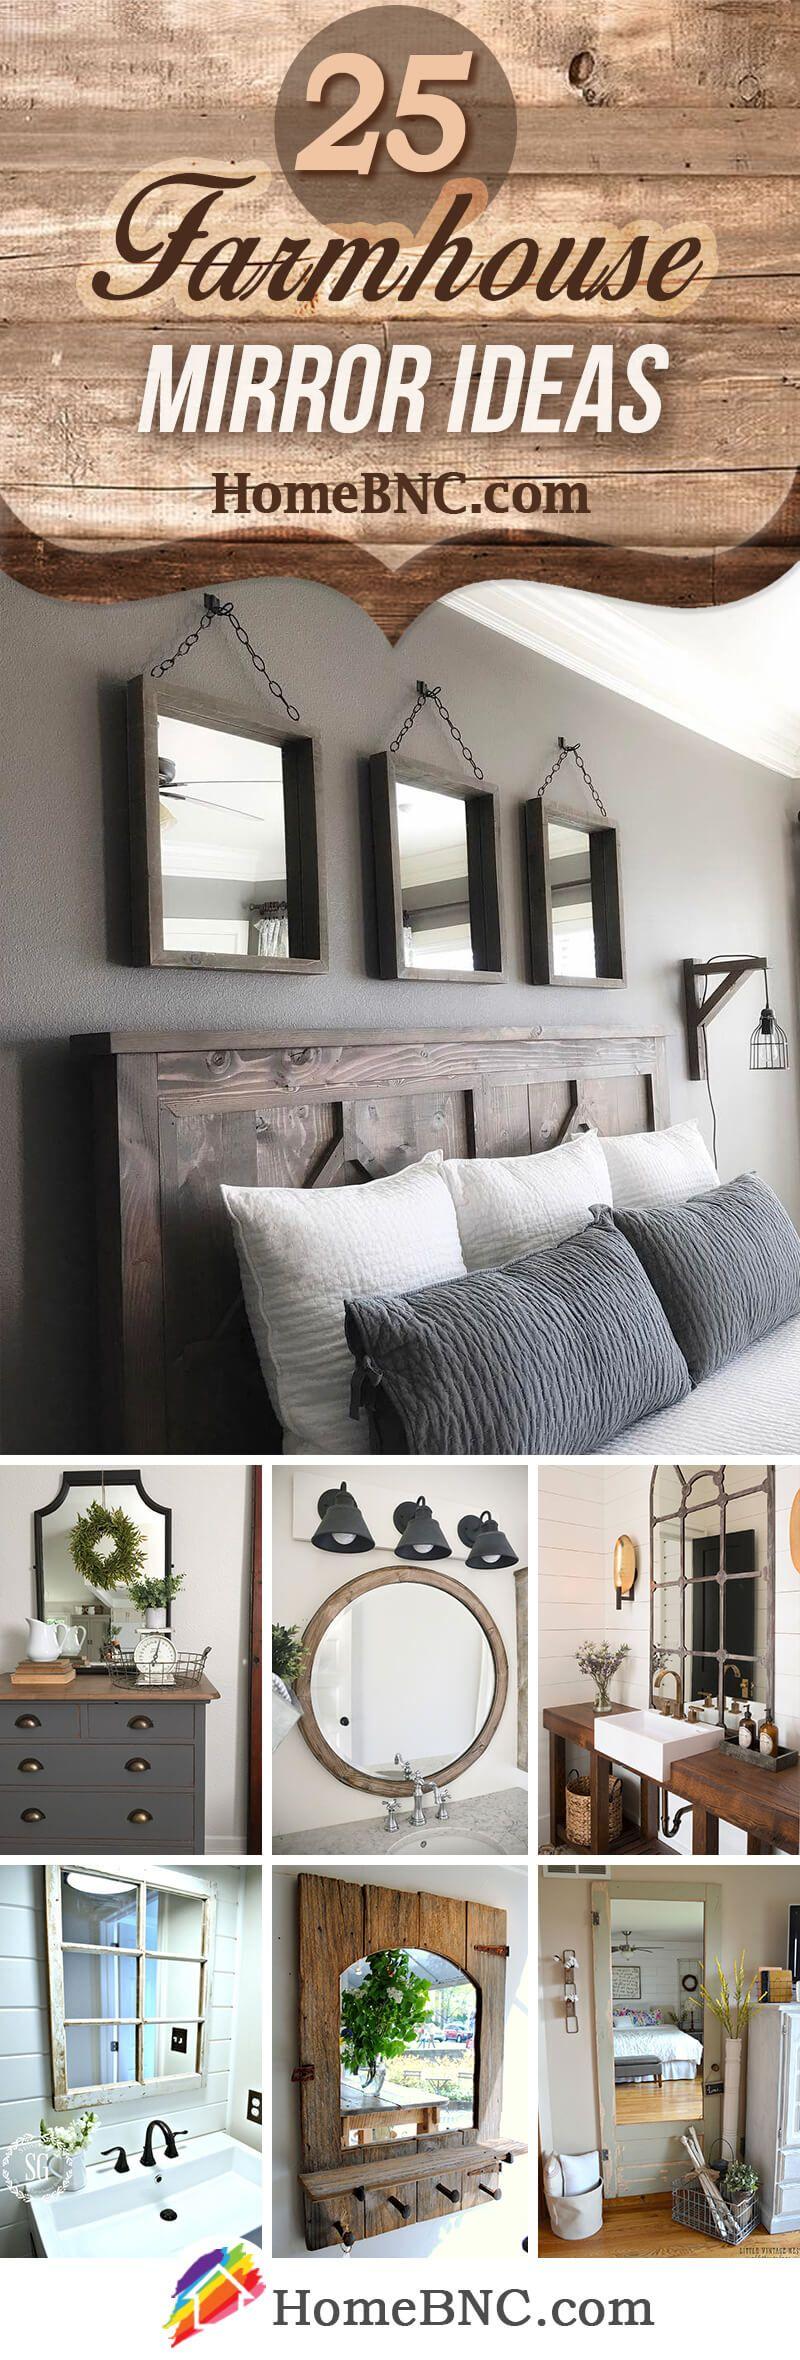 25 Best Farmhouse Master Bedroom Decor Ideas: 25 Pretty Farmhouse Mirror Ideas To Add Rustic Beauty To